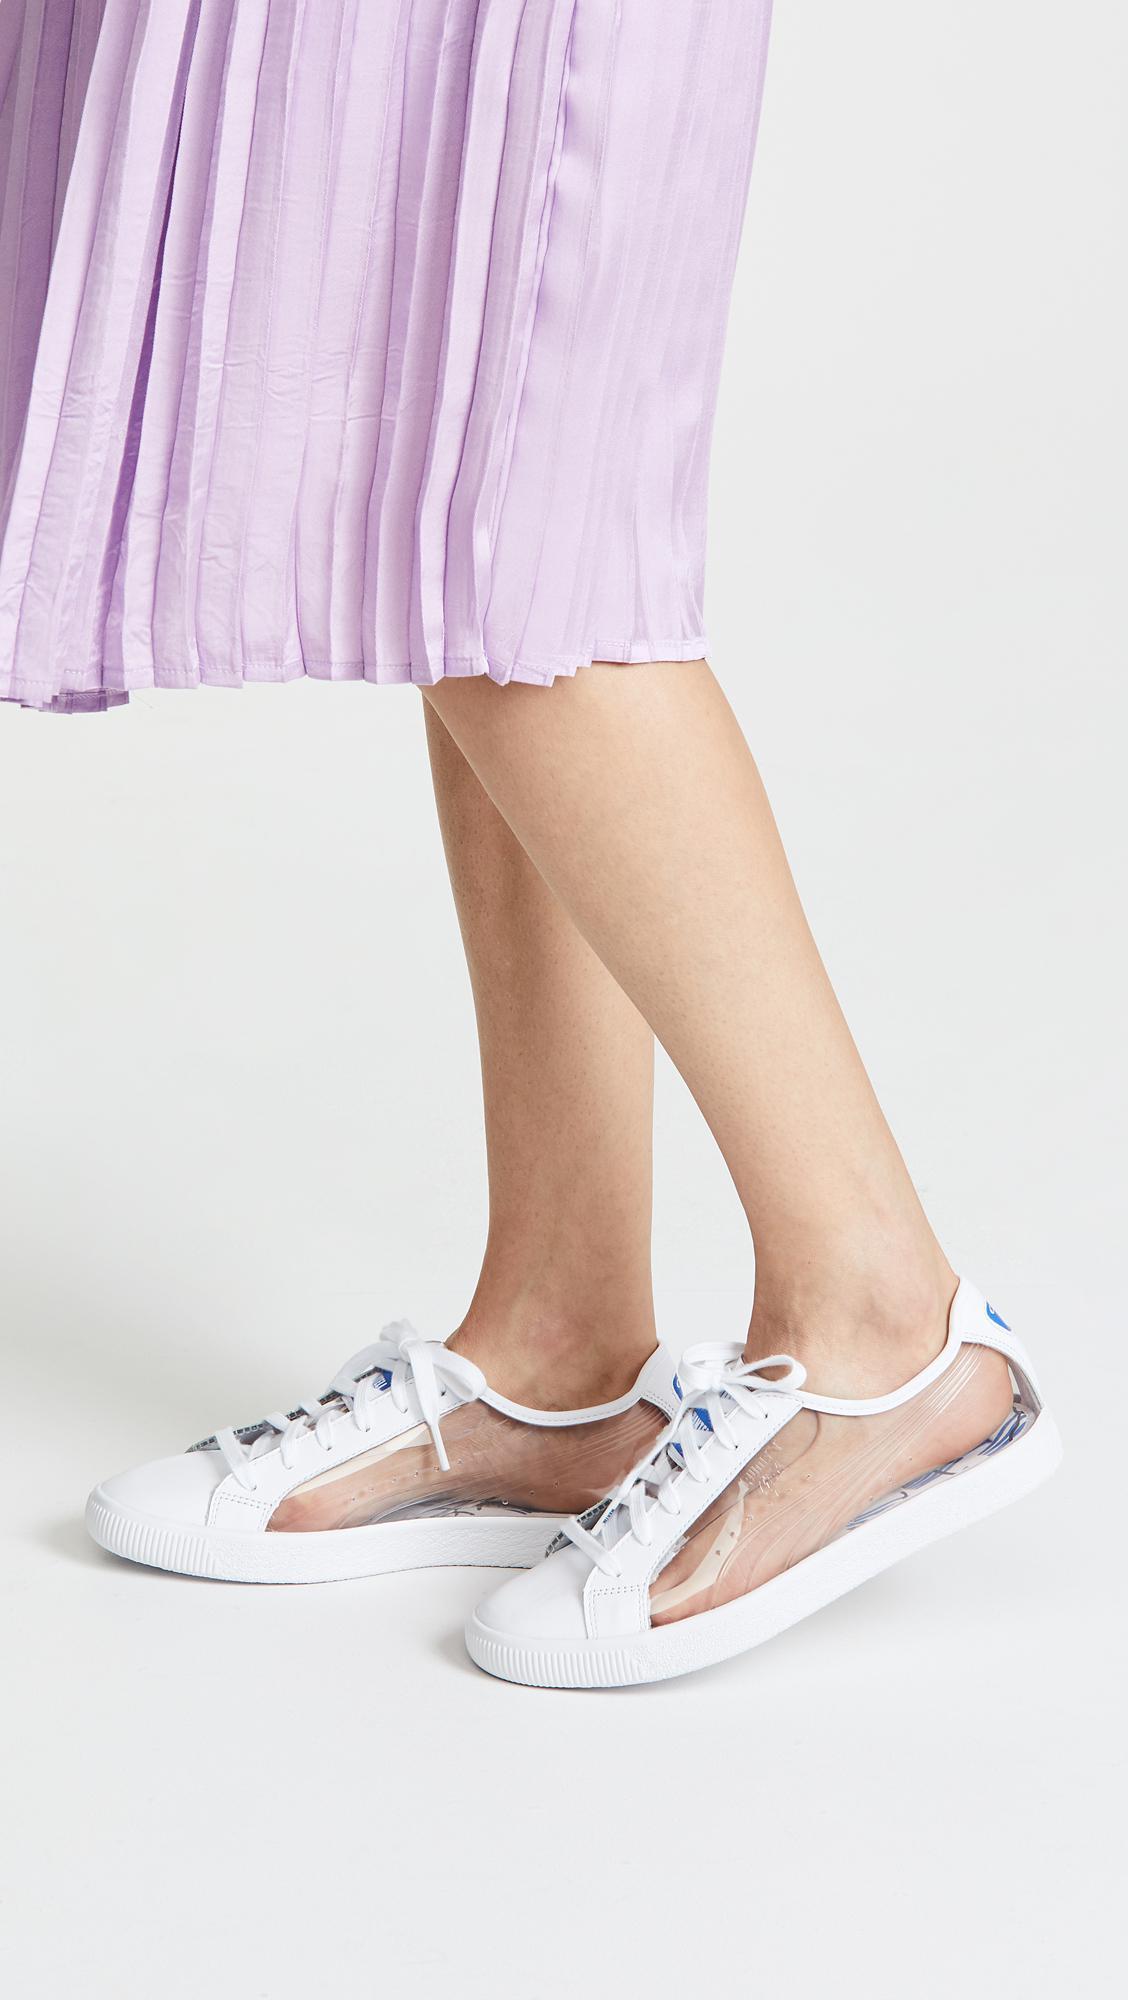 41d597766eea7 PUMA White X Shantell Martin Clyde Clear Sneakers